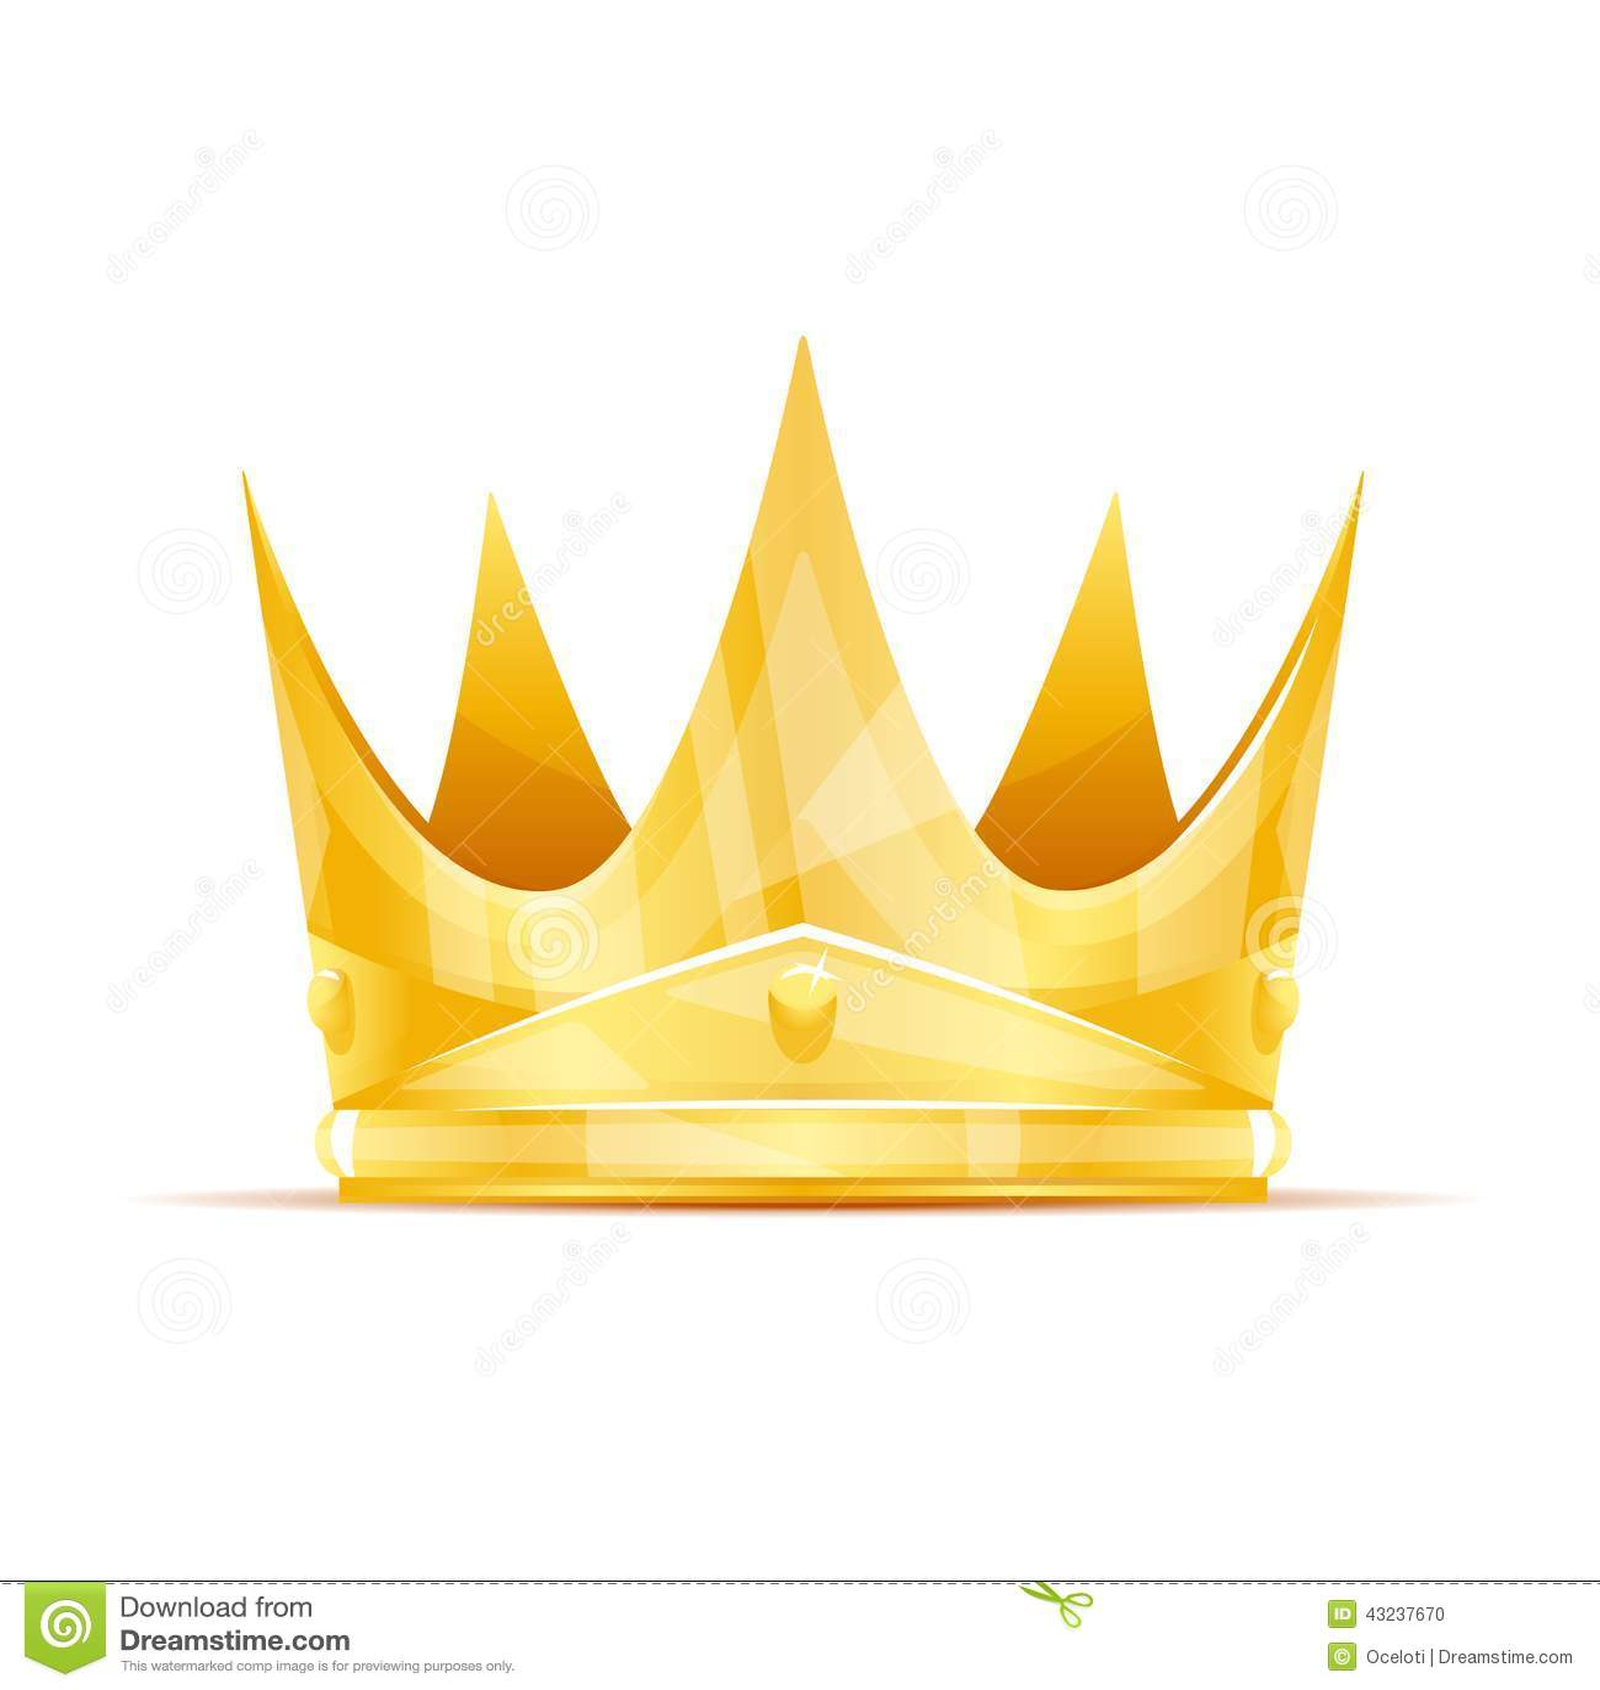 Golden queen crown with sharp edges, eps10 .